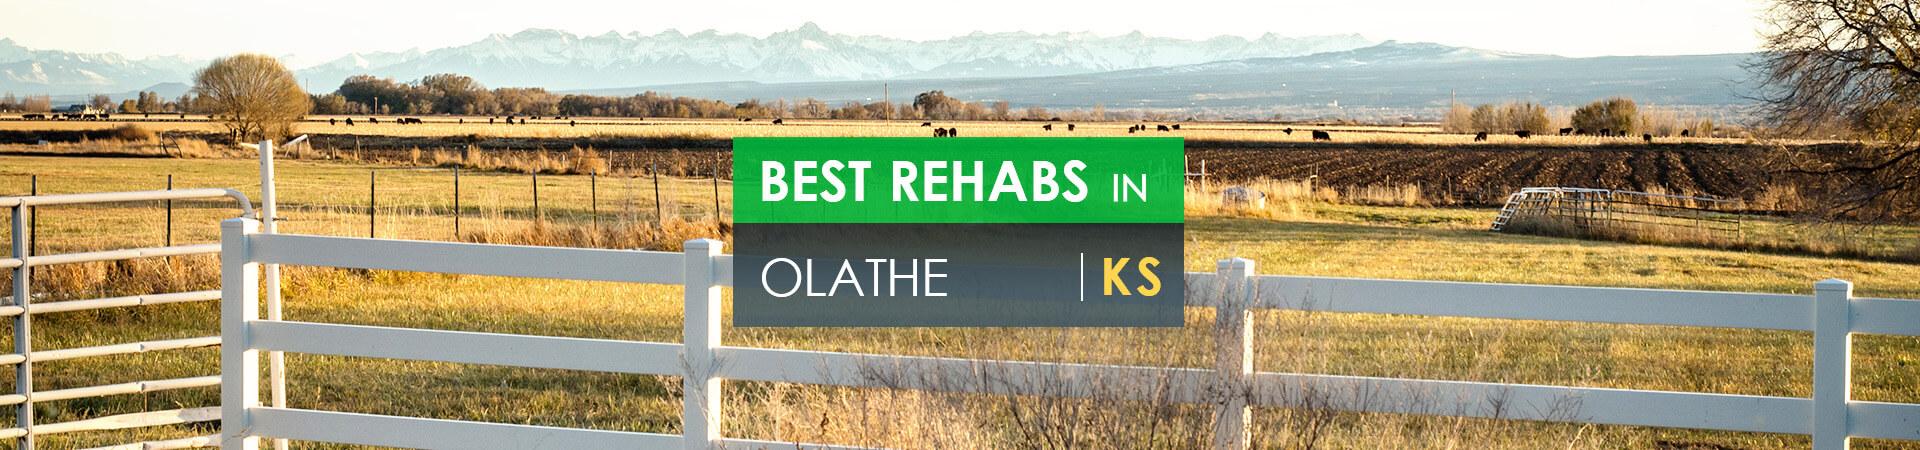 Best rehabs in Olathe, KS